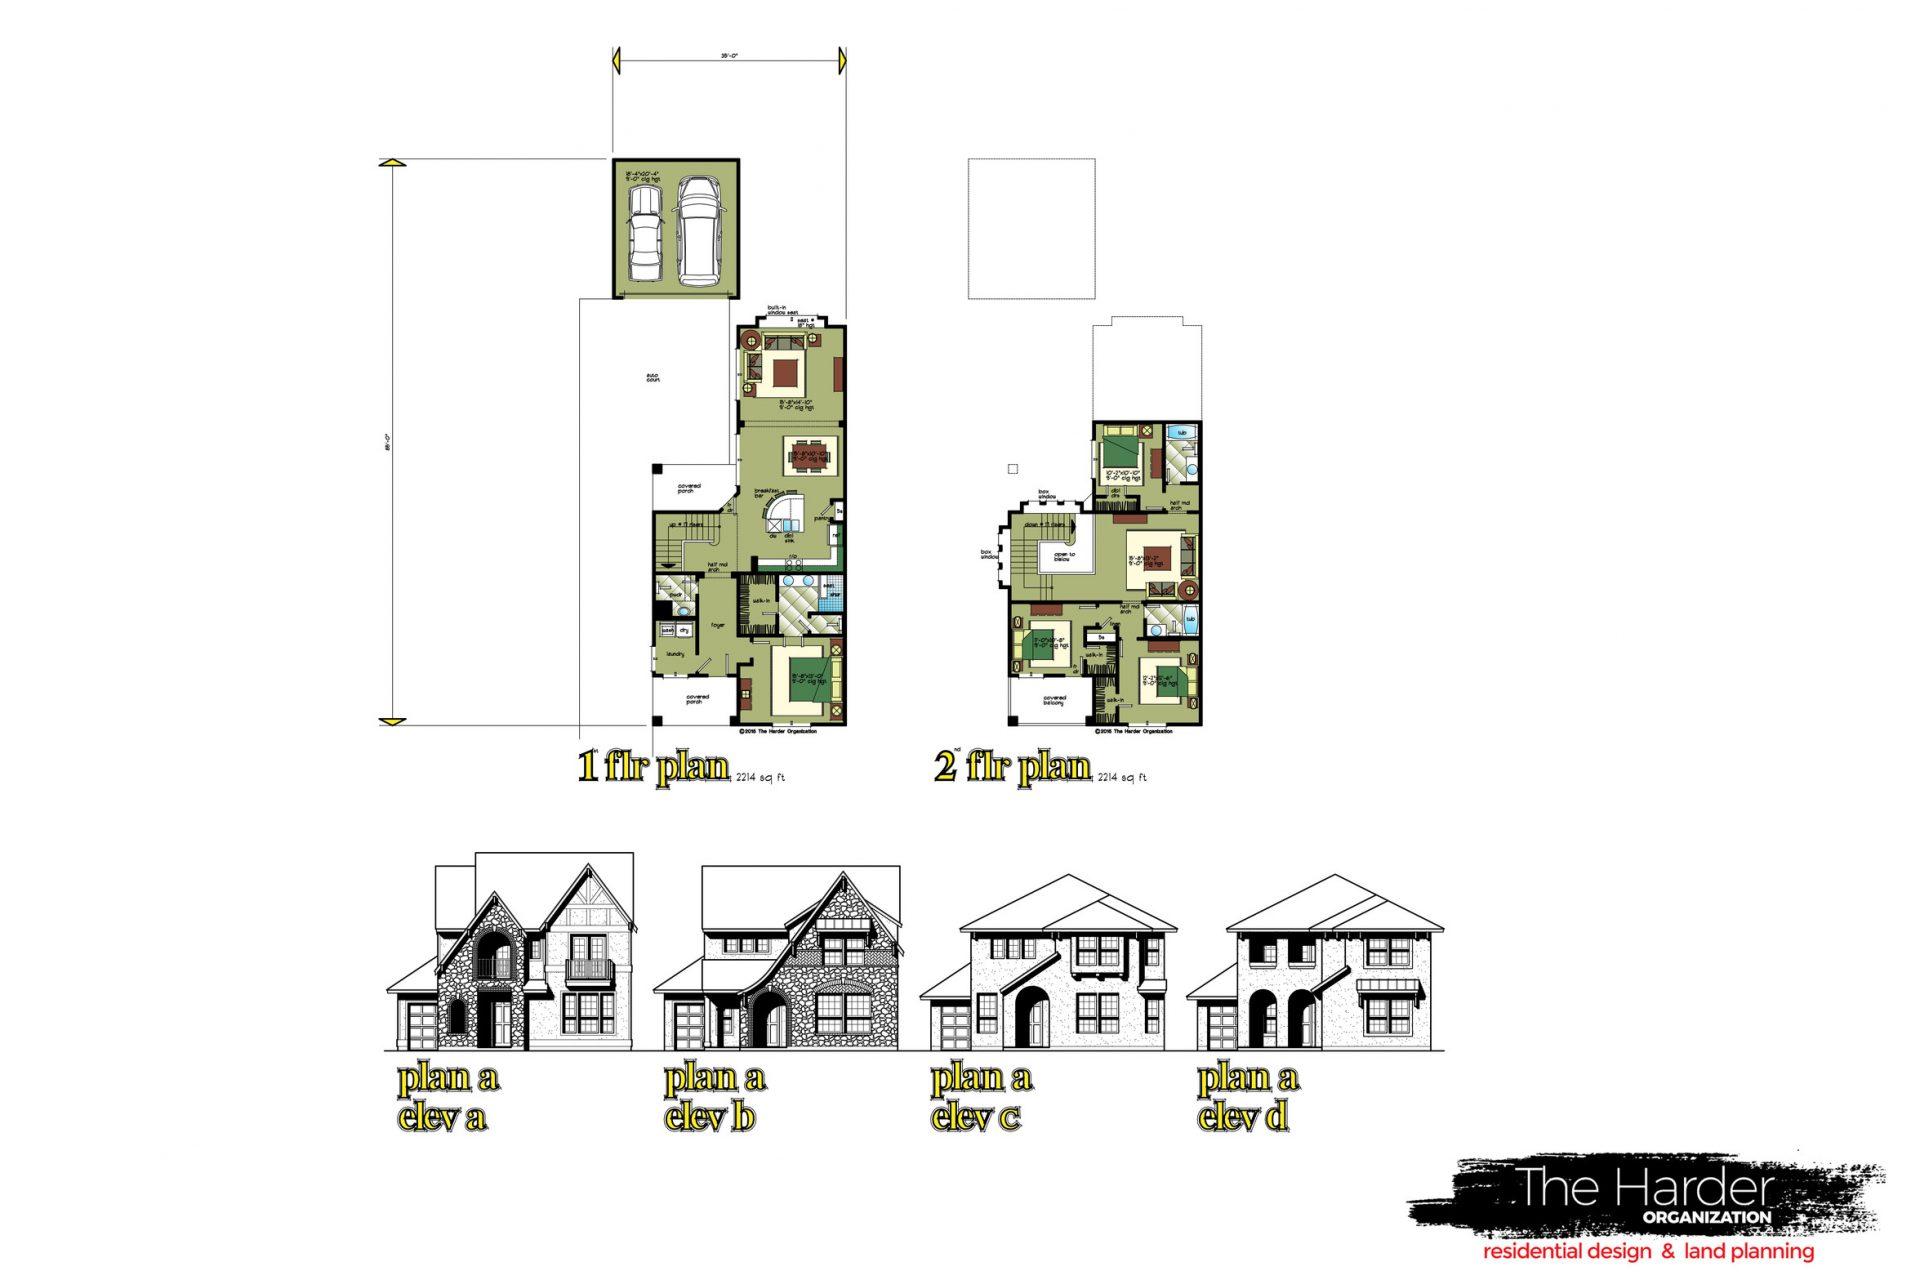 J:(Drawings)Meridian homesdetached gar site plan conceptdeta